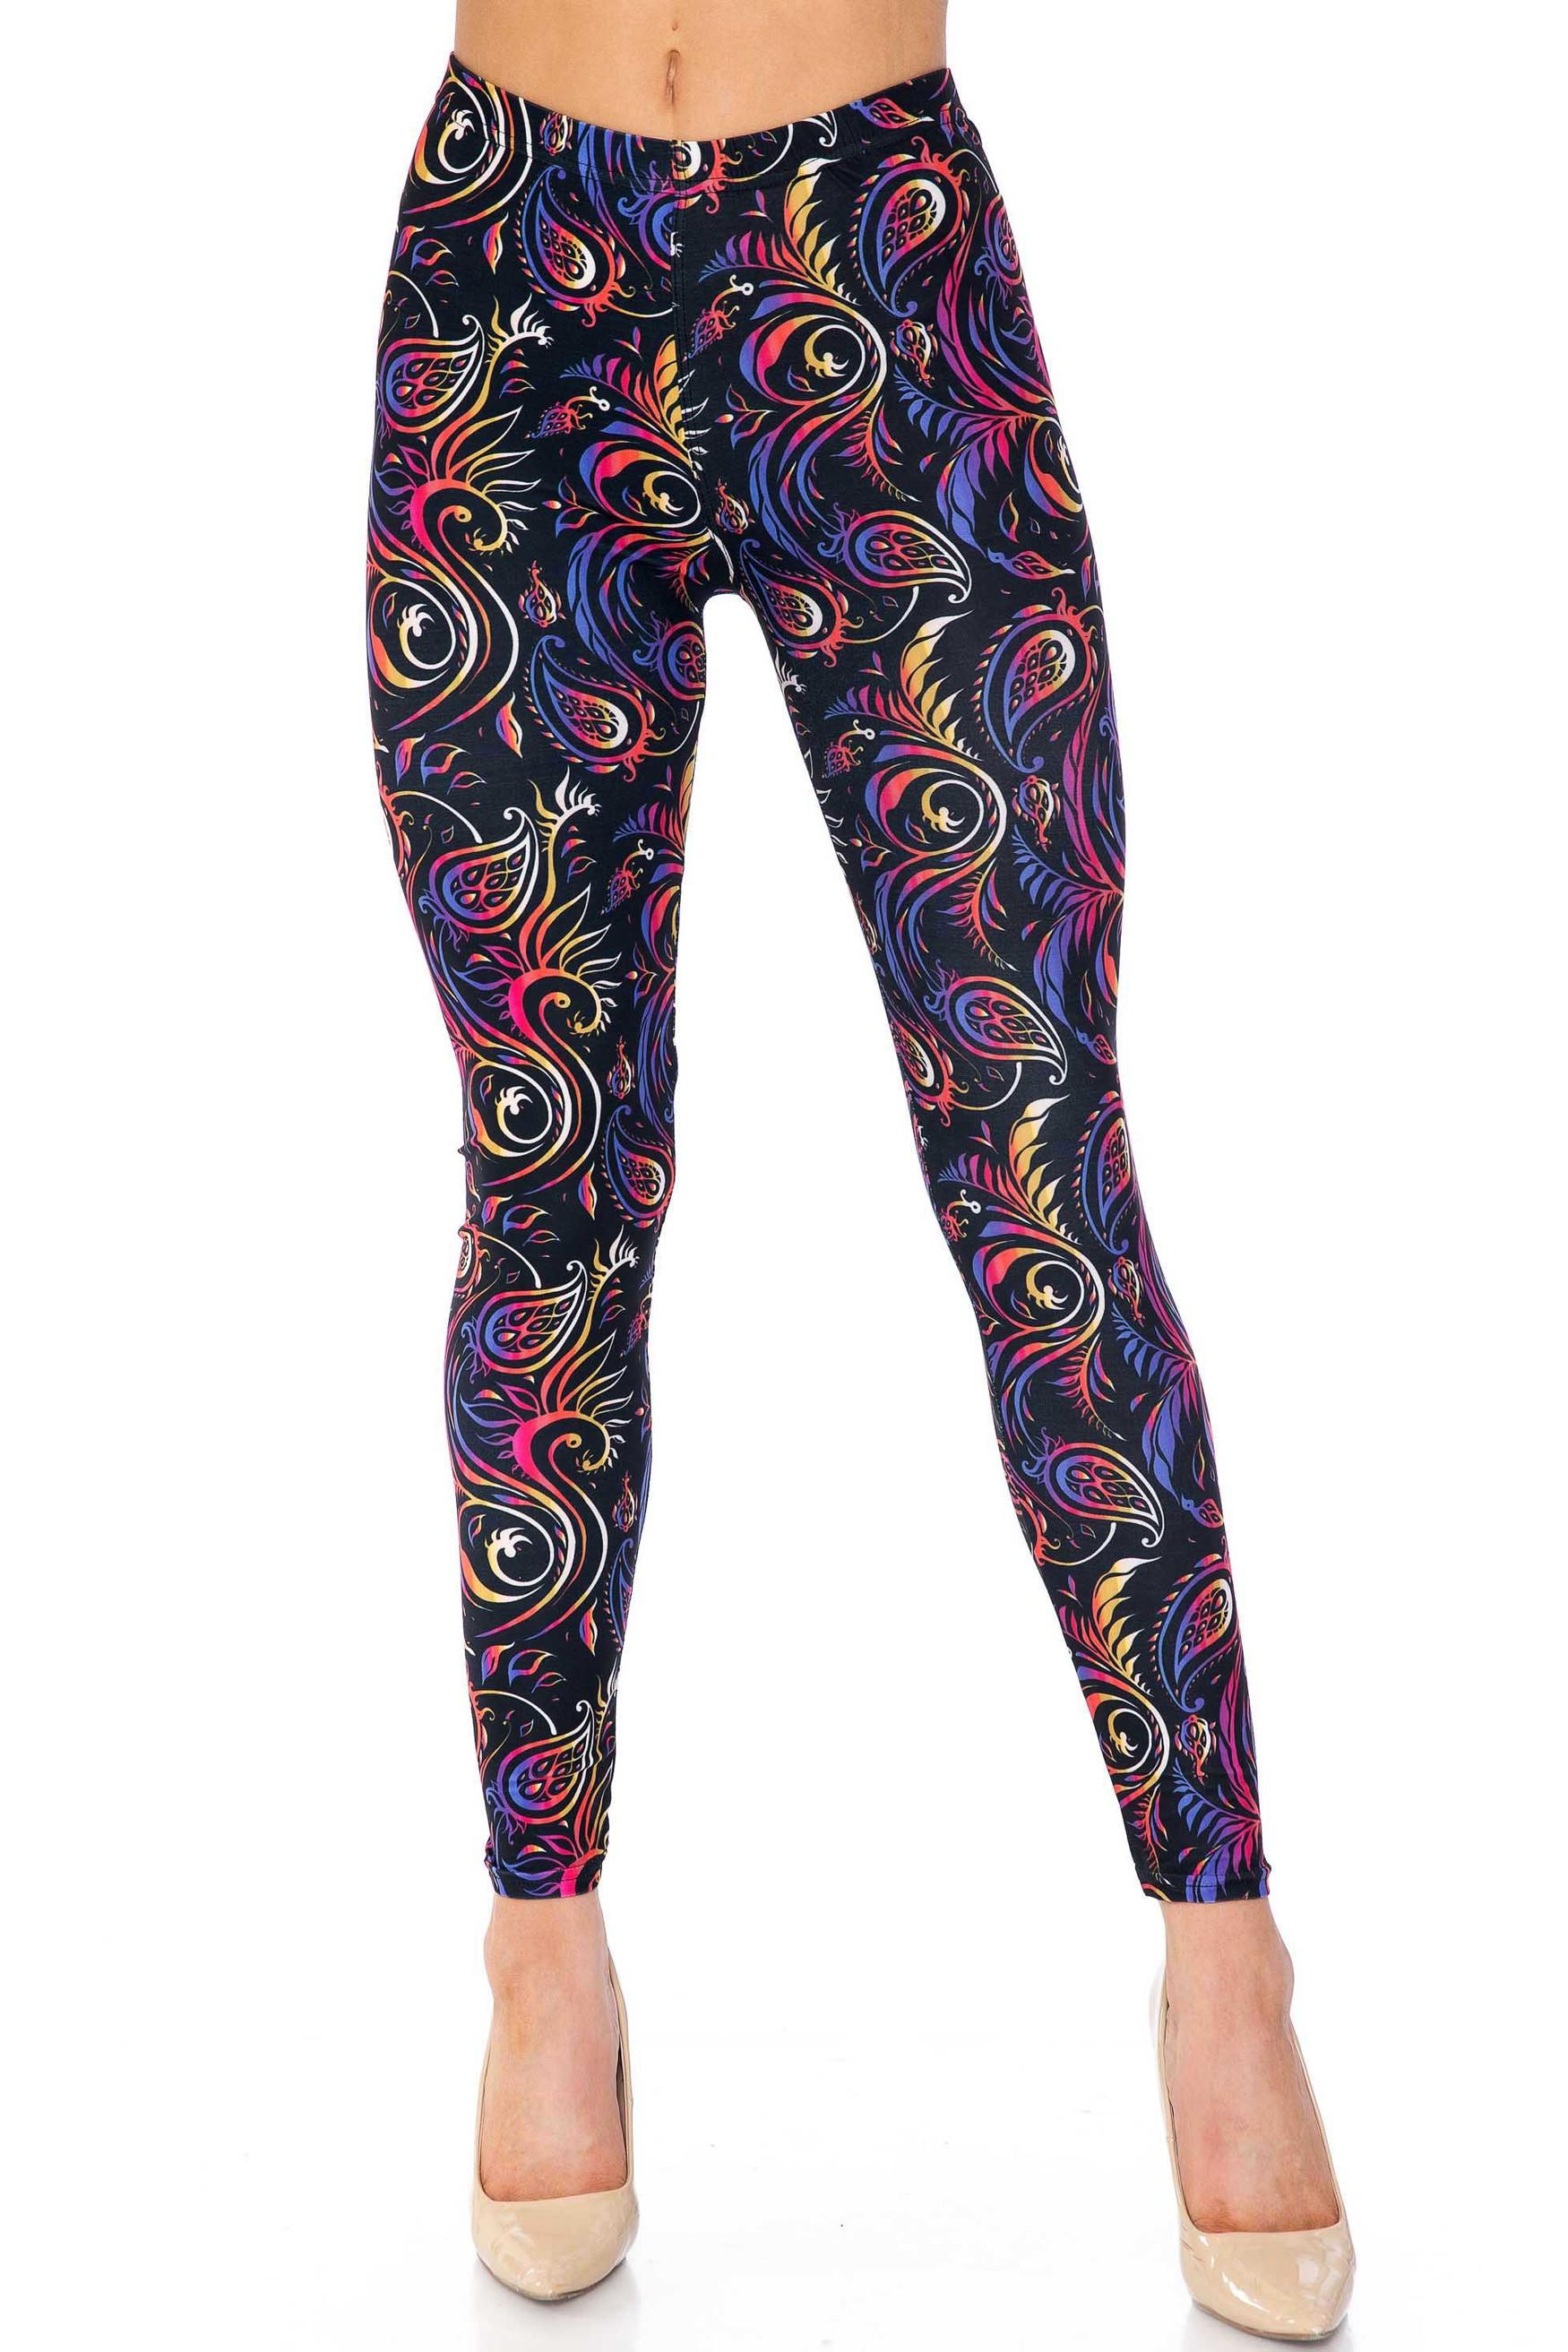 Creamy Soft Ombre Paisley Swirl Leggings - USA Fashion™